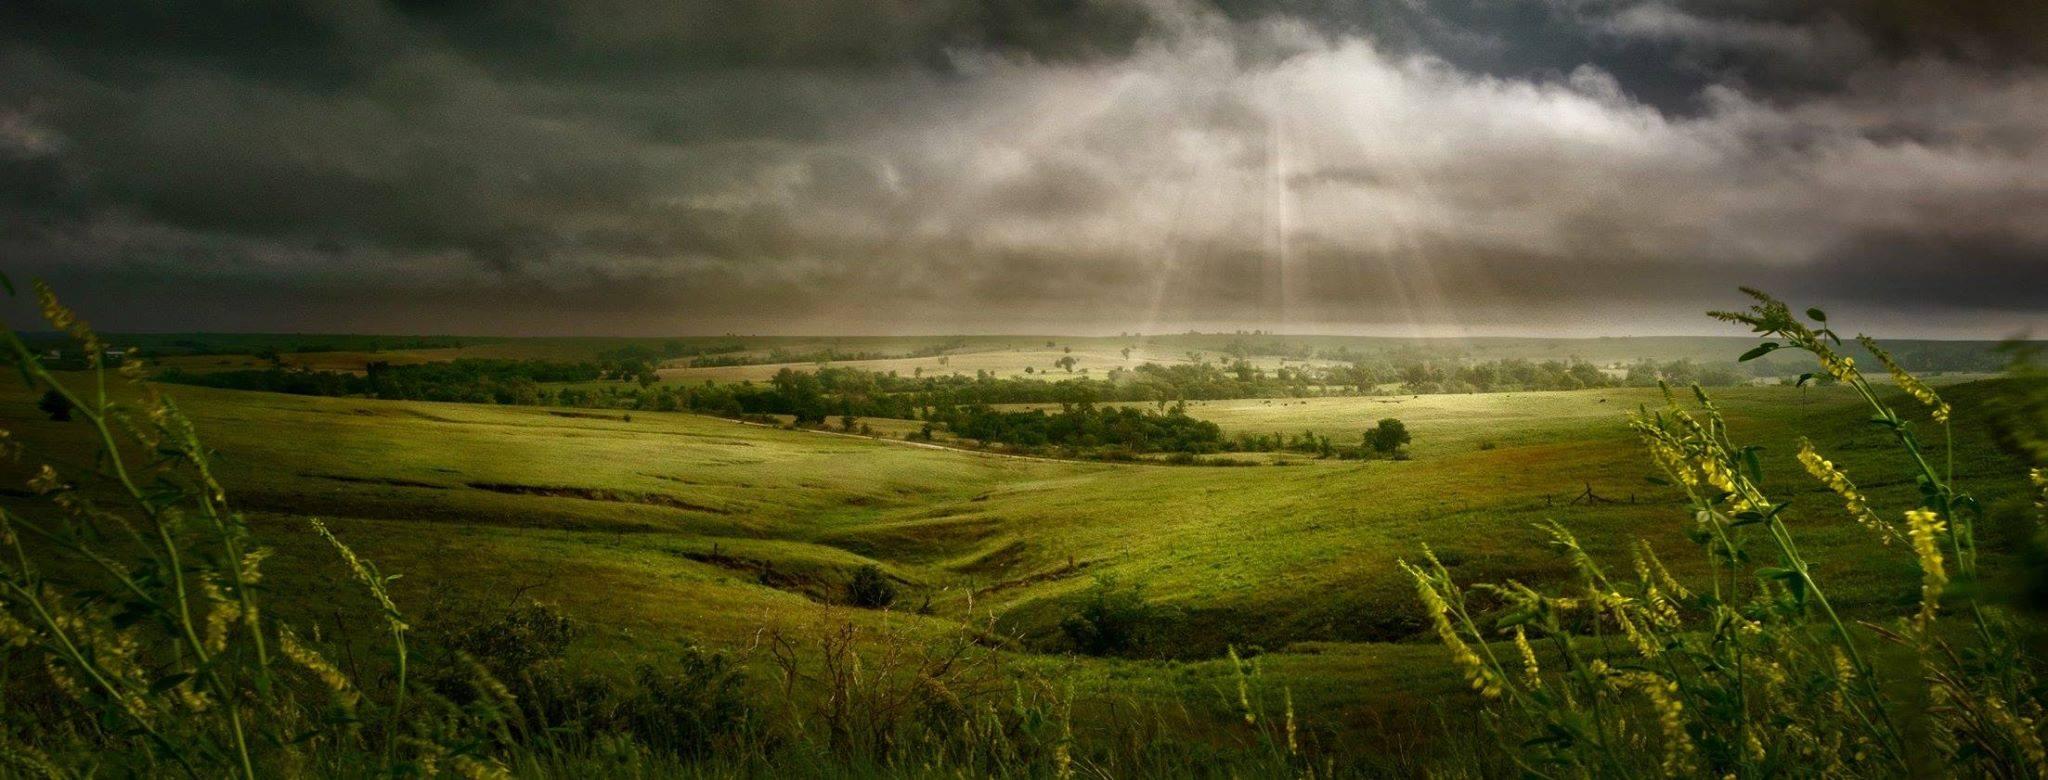 macmillanworks.com Colin MacMillan Kansas Sunset Photography